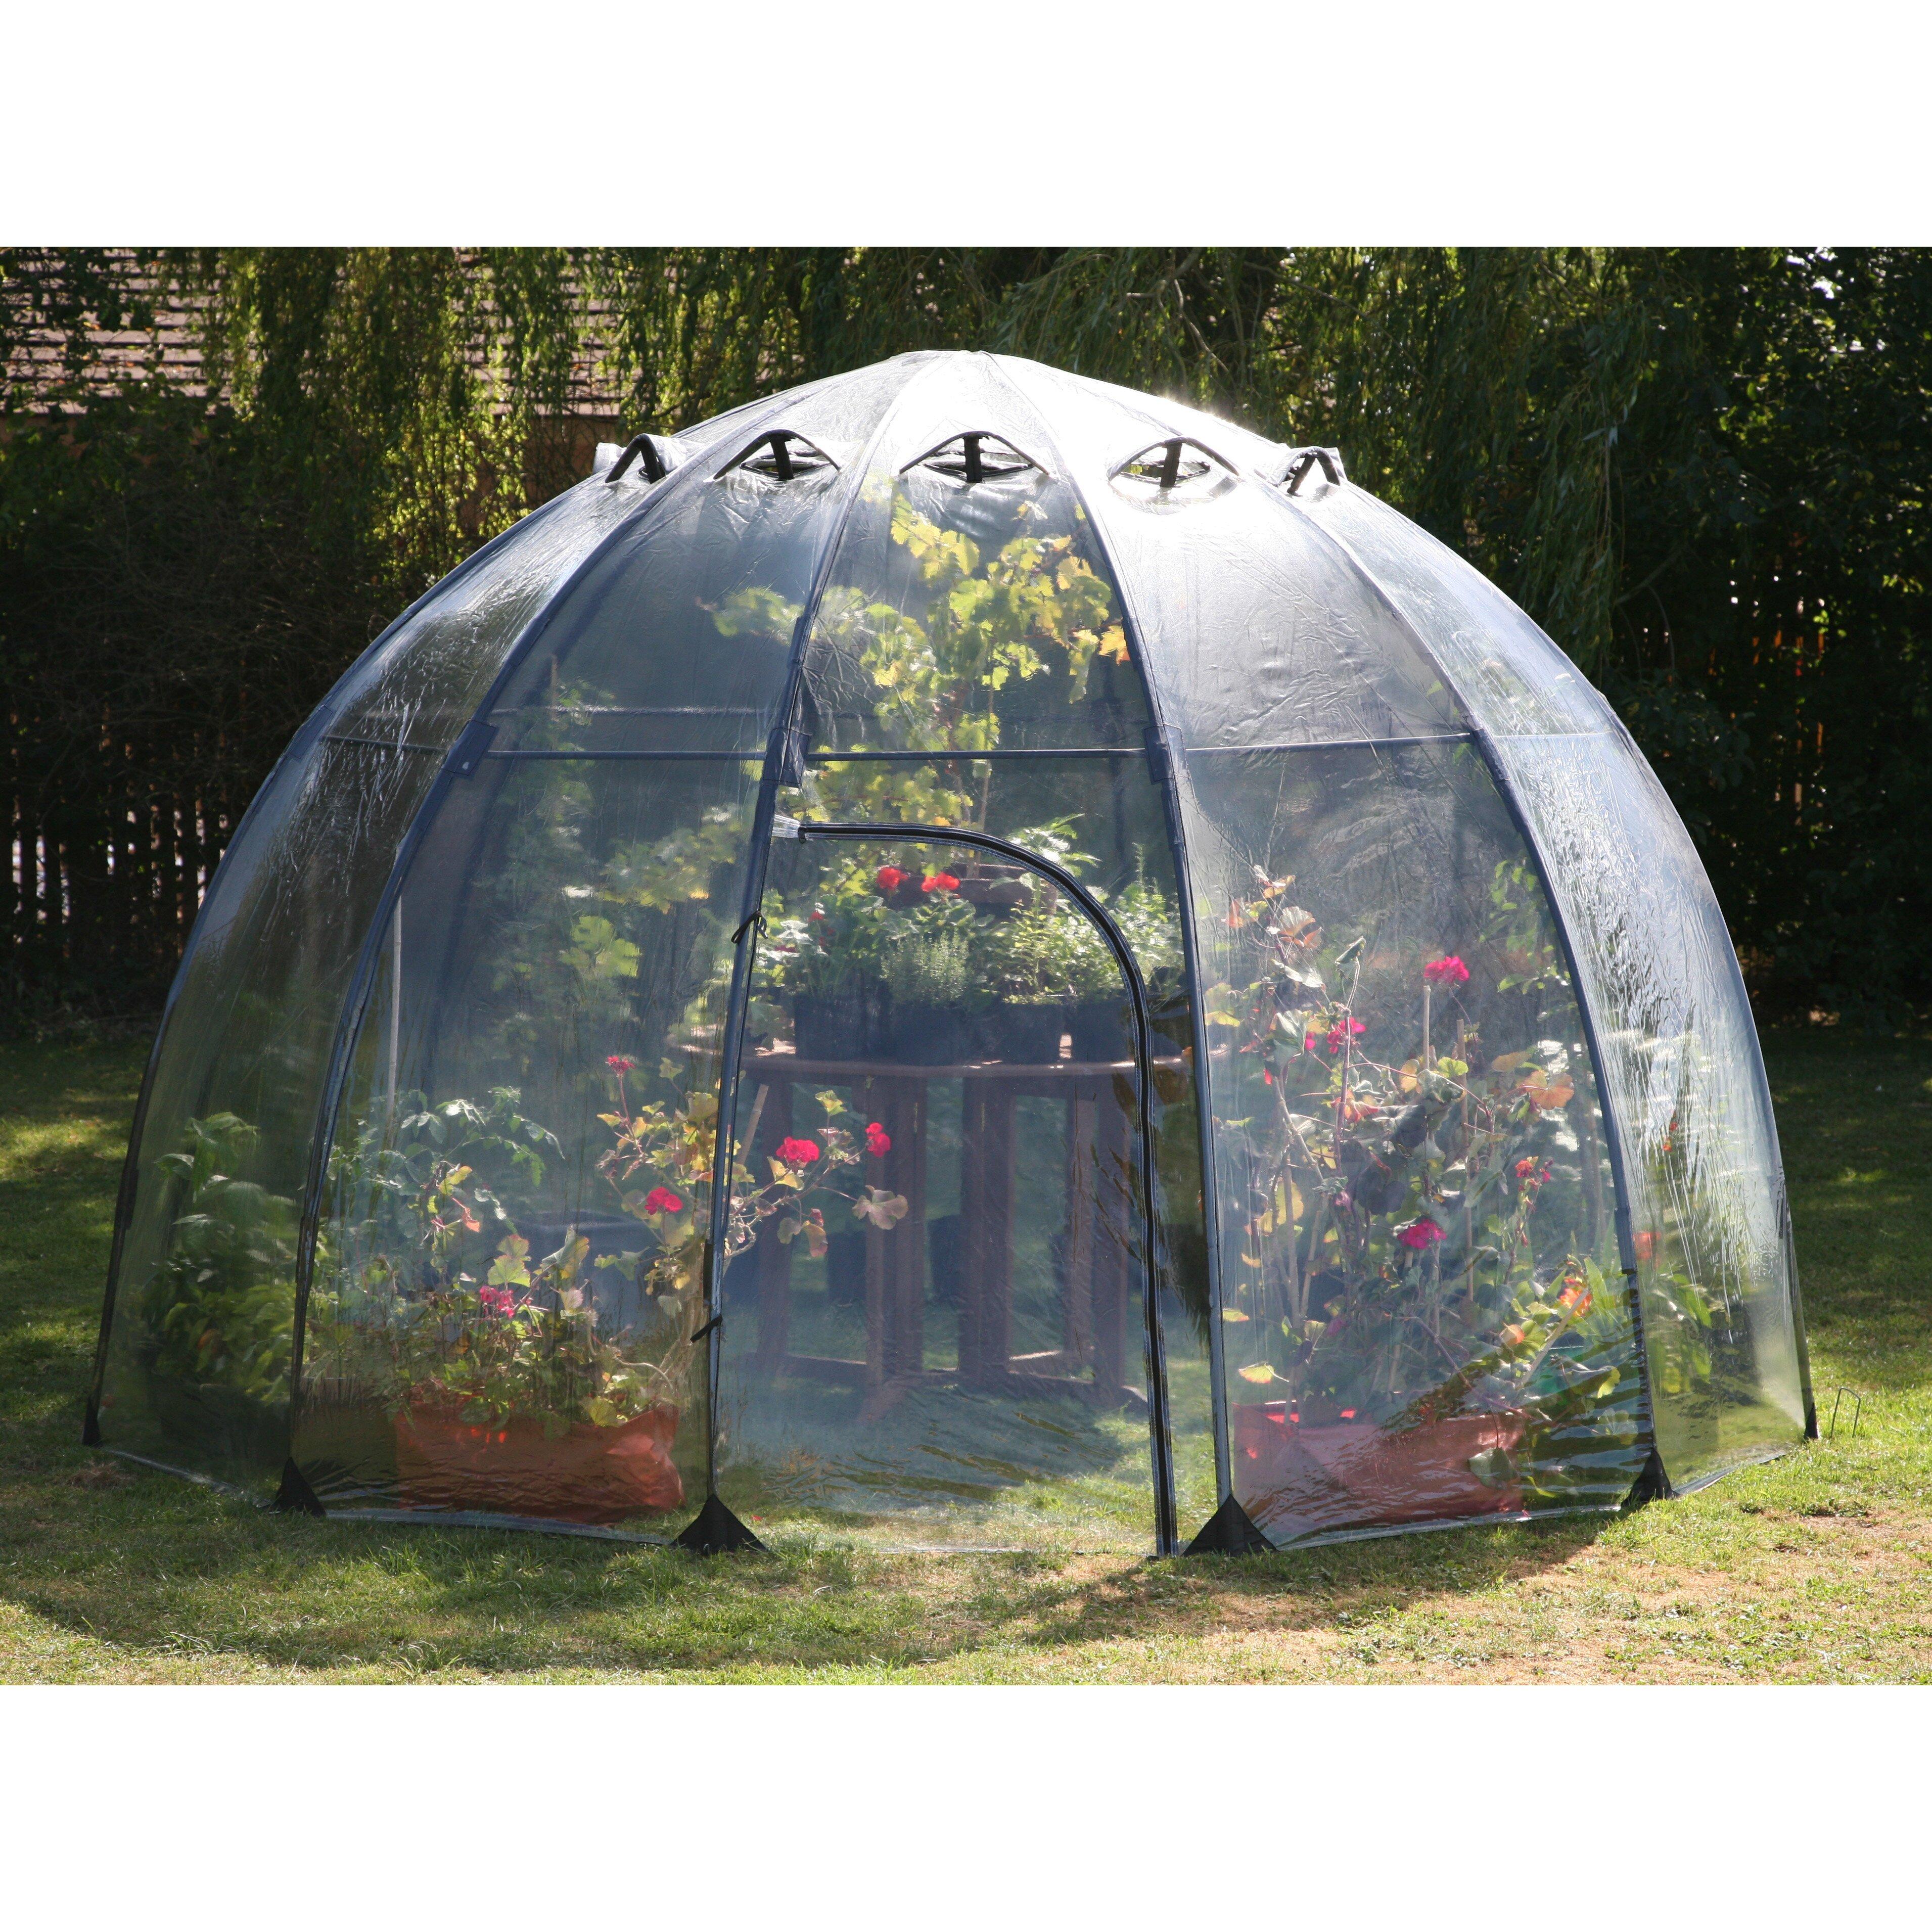 Tierra Garden Haxnicks 11 5 Ft W X 11 5 Ft D Greenhouse